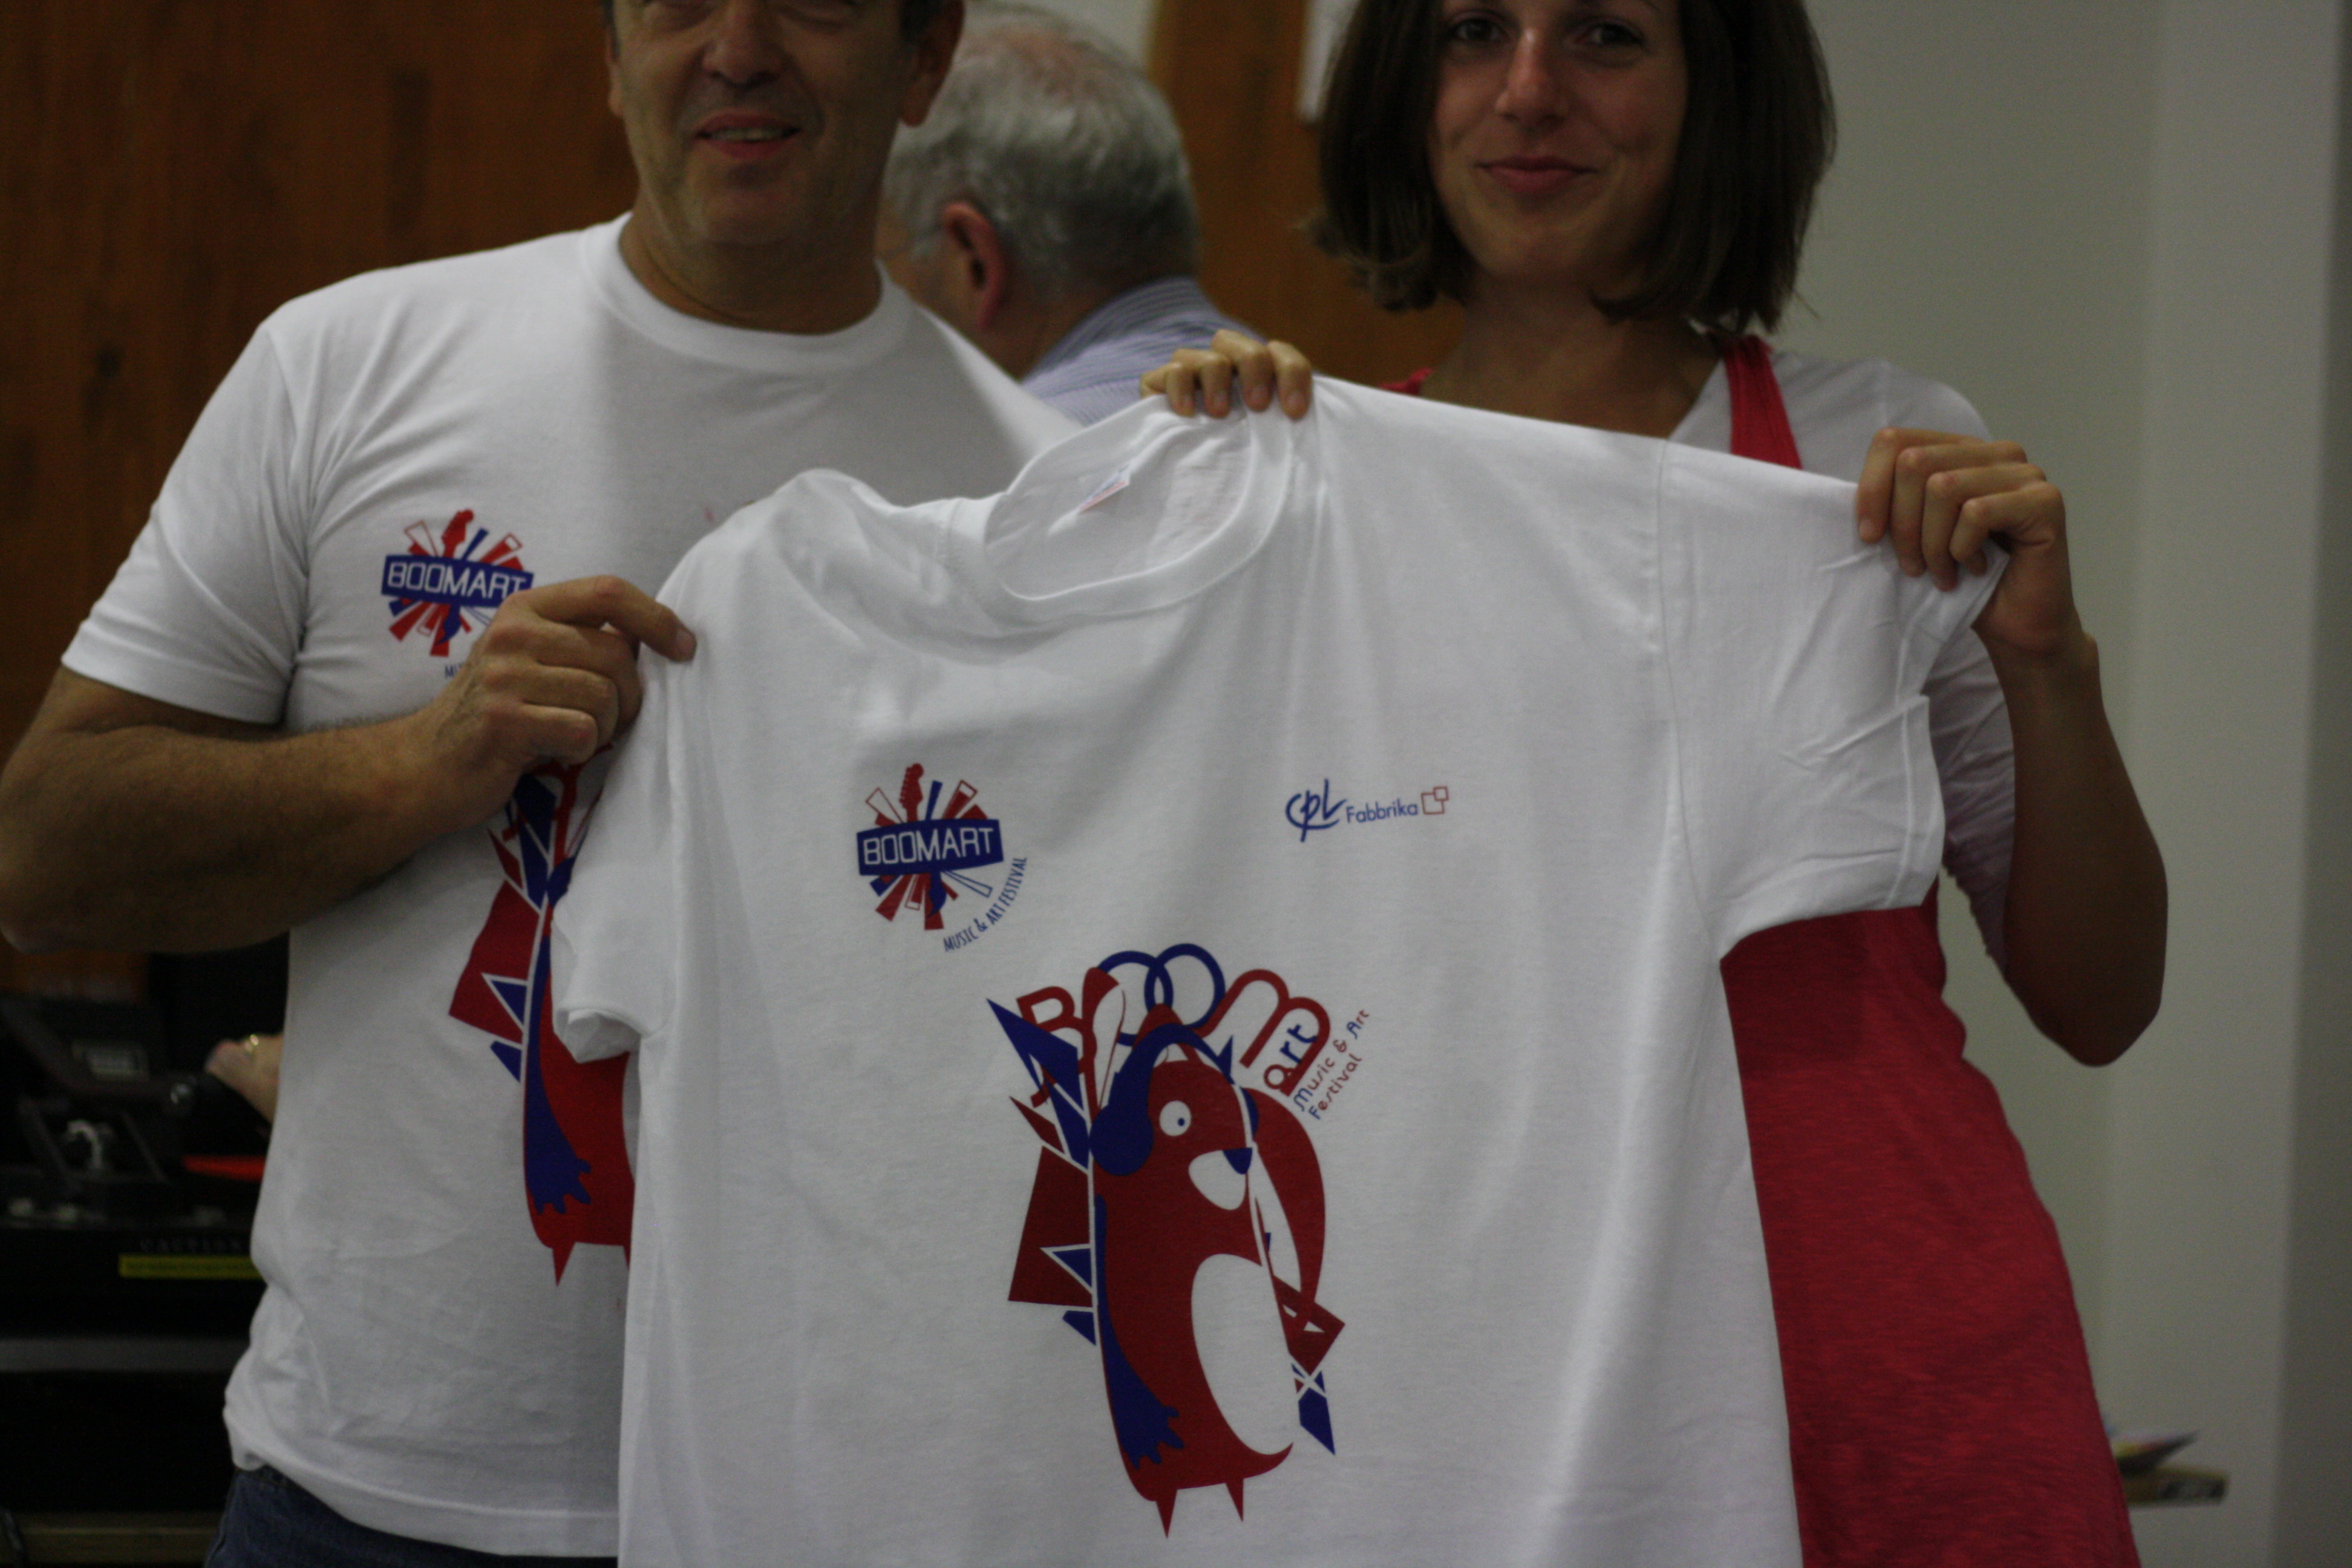 stampa su tshirt